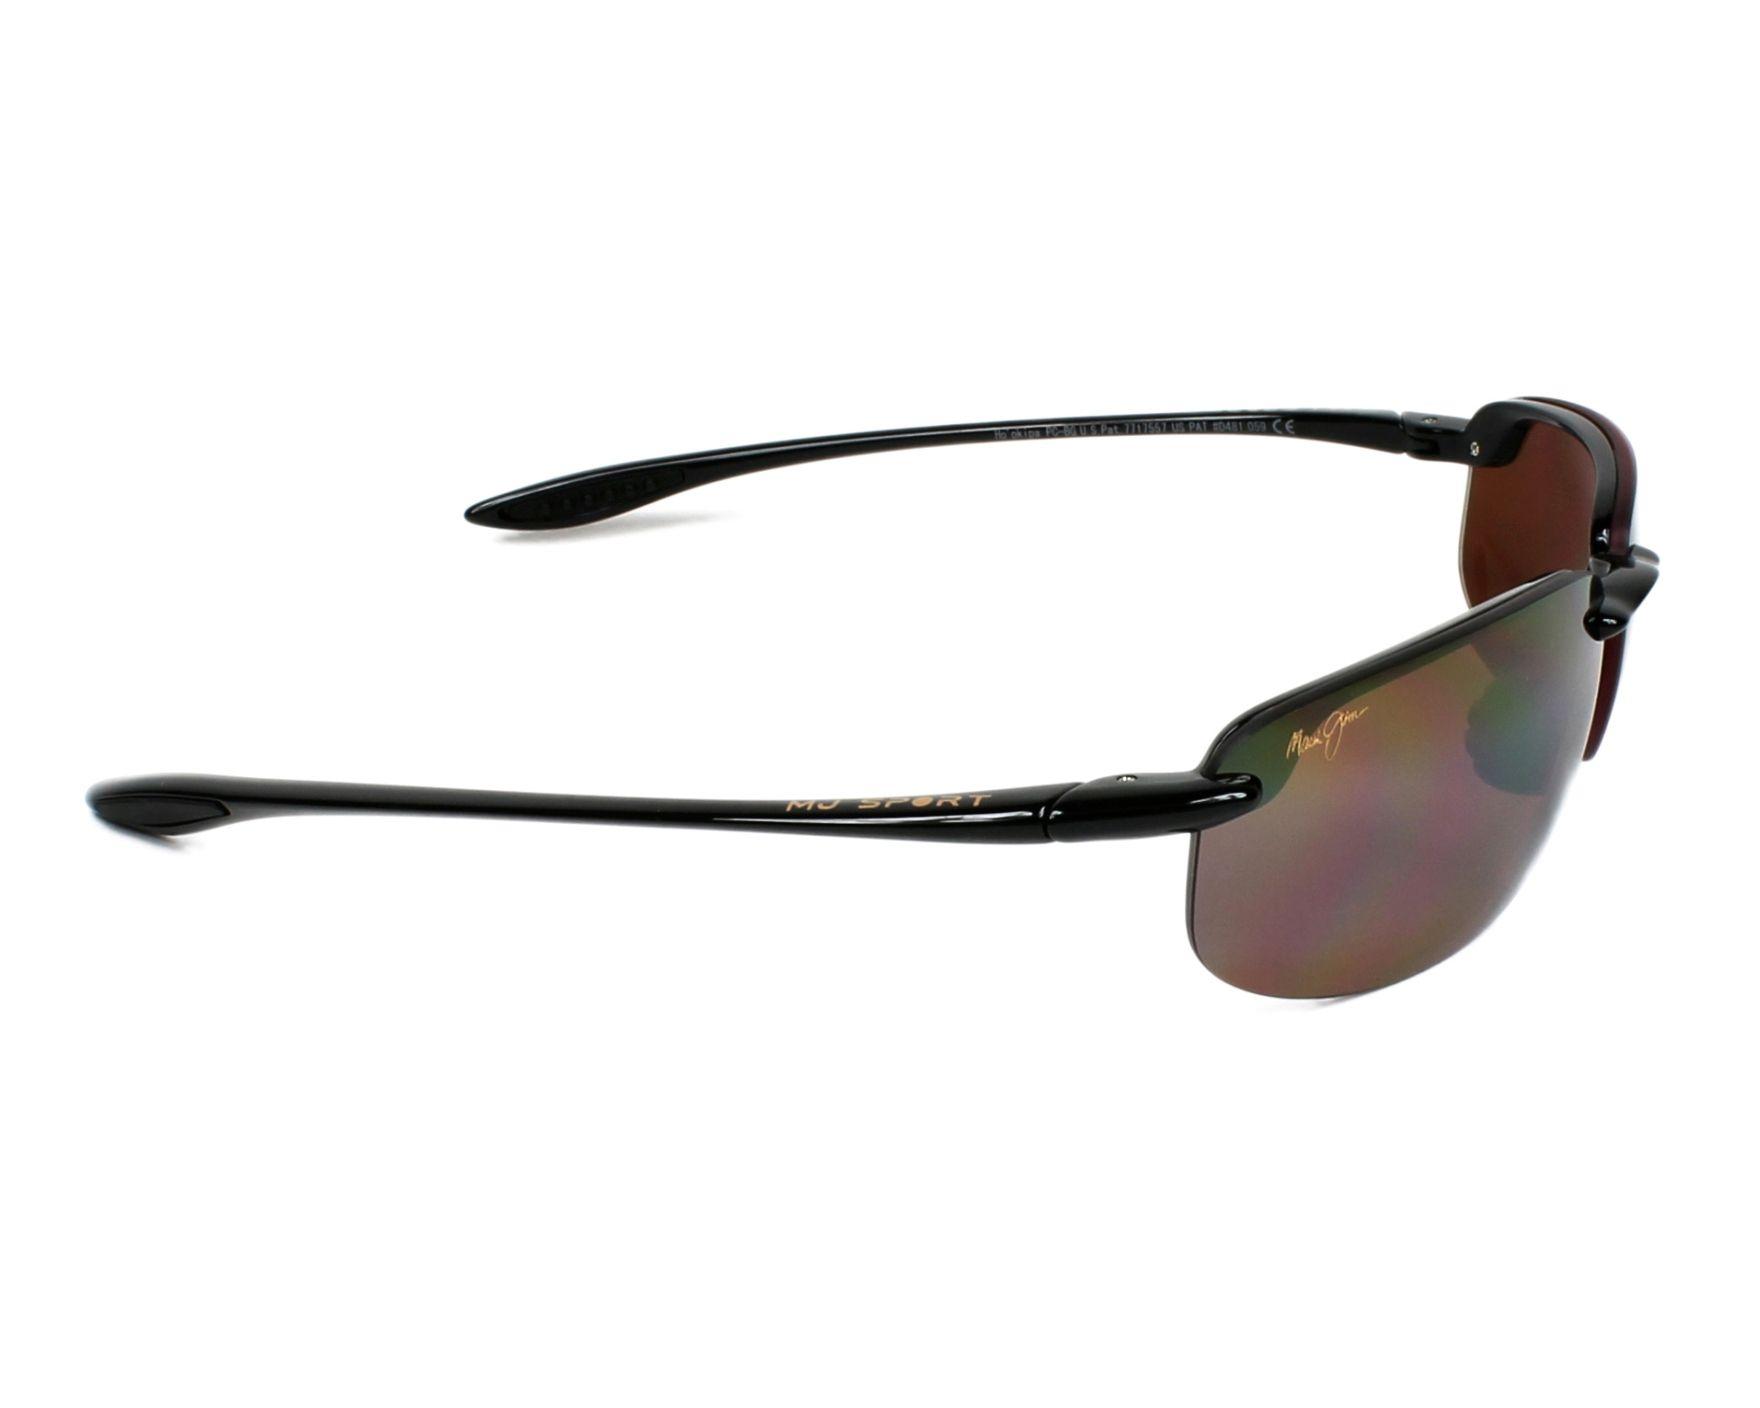 Sunglasses Maui Jim H-407 02 64-17 Black side view f6391f9ac554